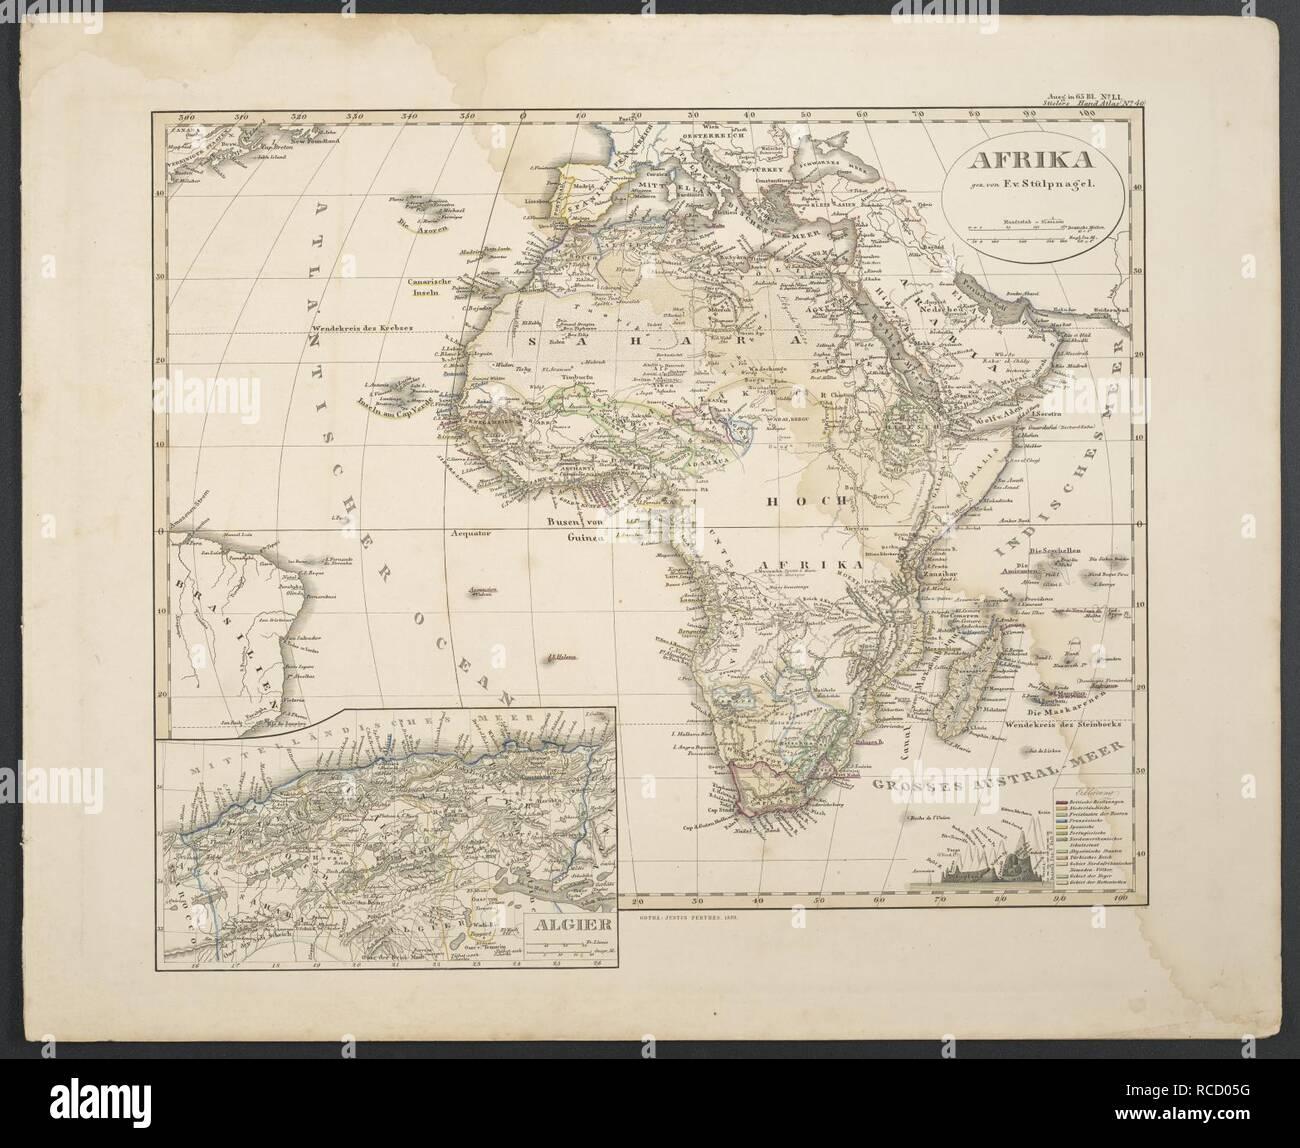 Afrika - Stieler's Hand-Atlas 1859. - Stock Image